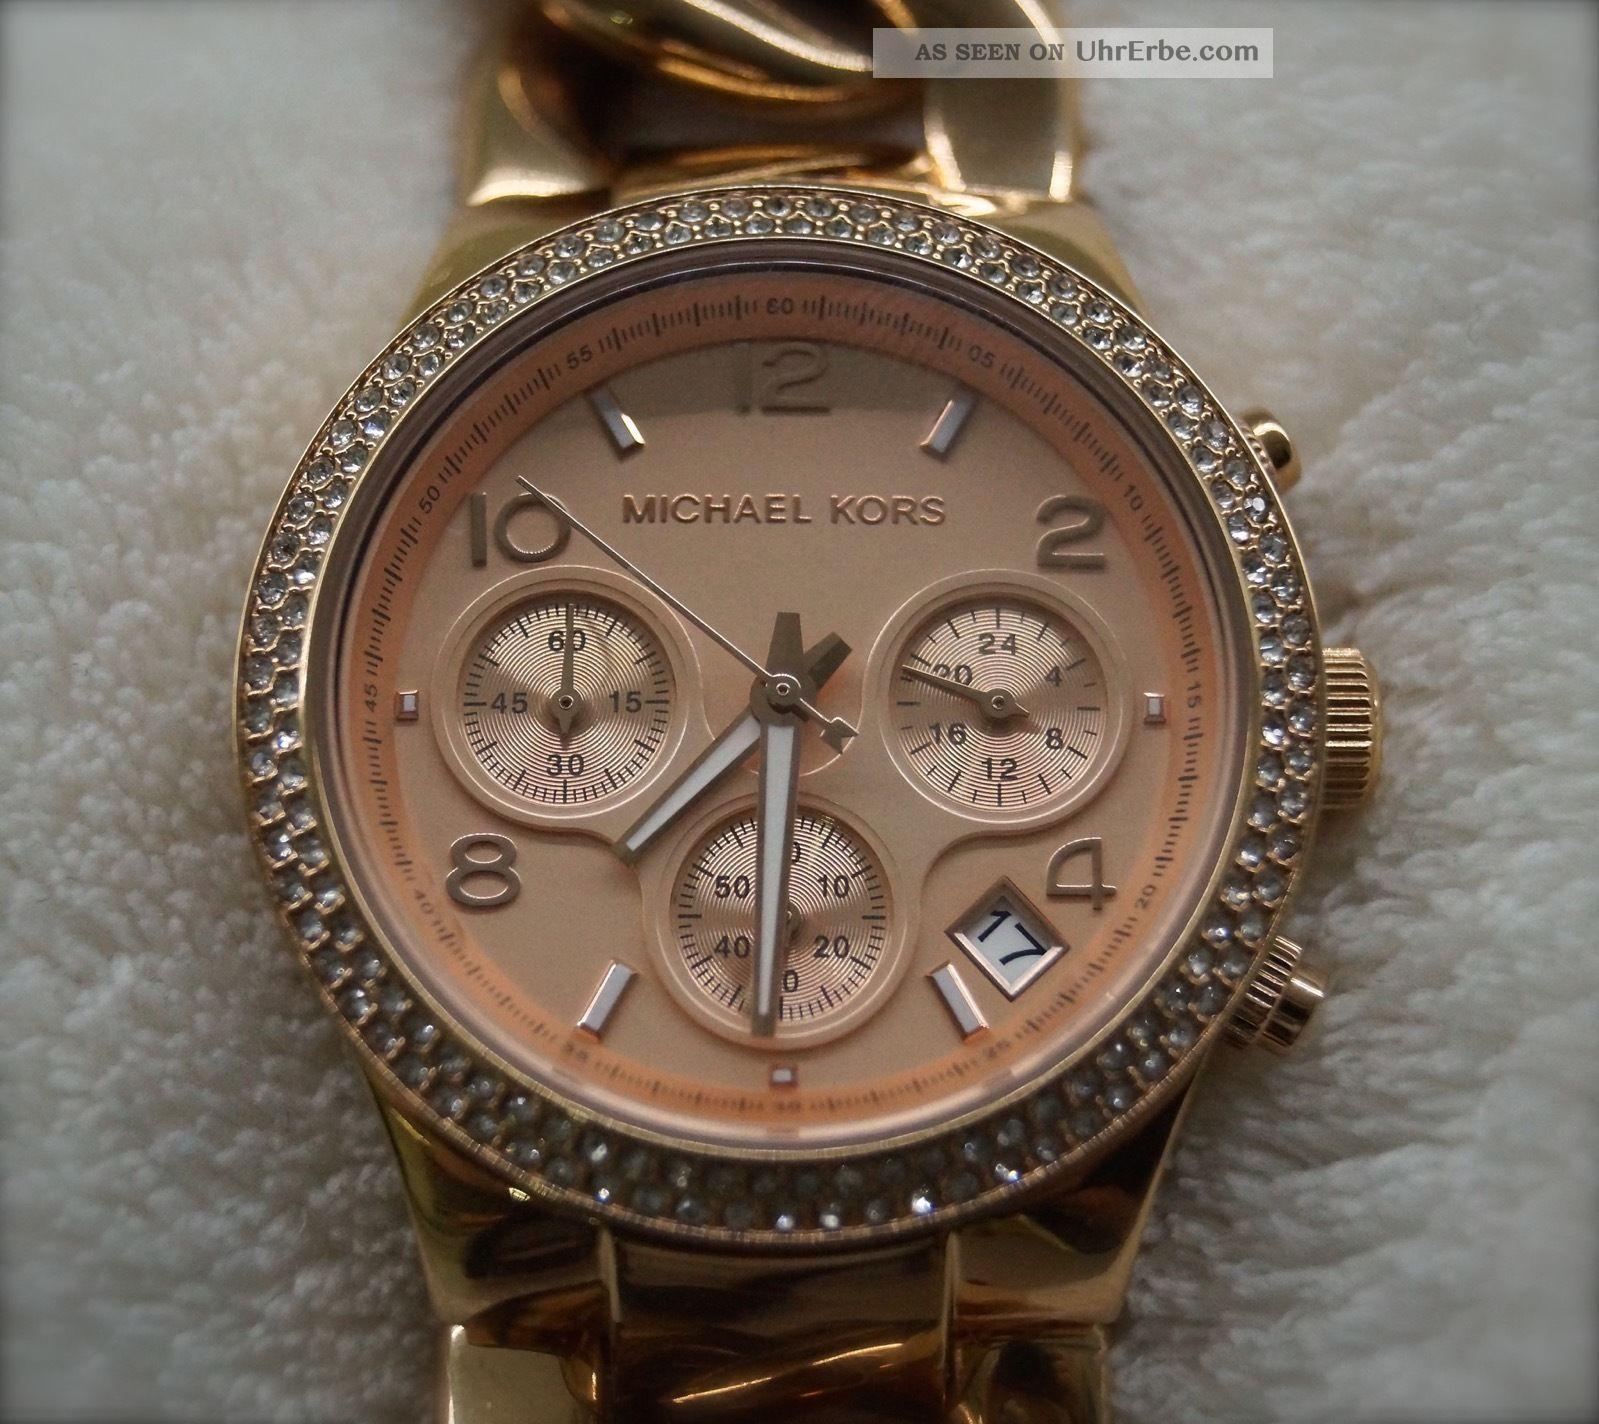 Michael Kors Mk3247 Armbanduhr Für Damen Armbanduhren Bild